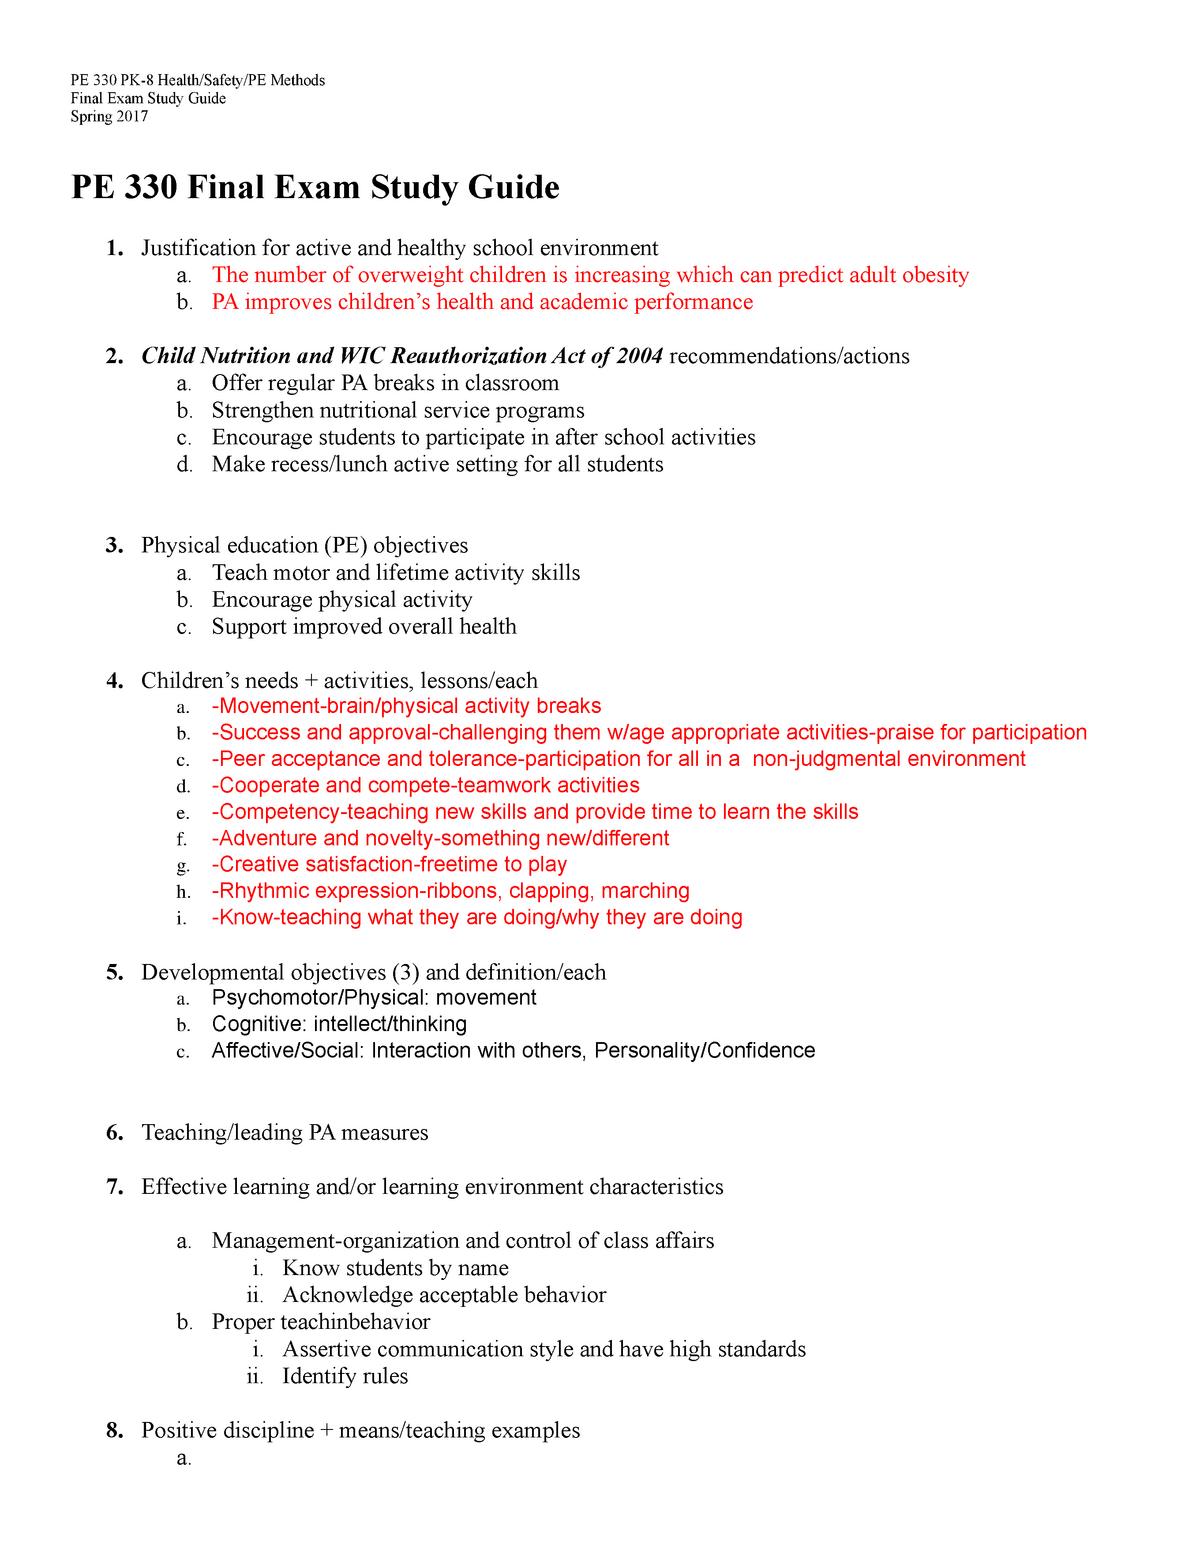 PE Final Exam Study Guide - PE 330 - StuDocu